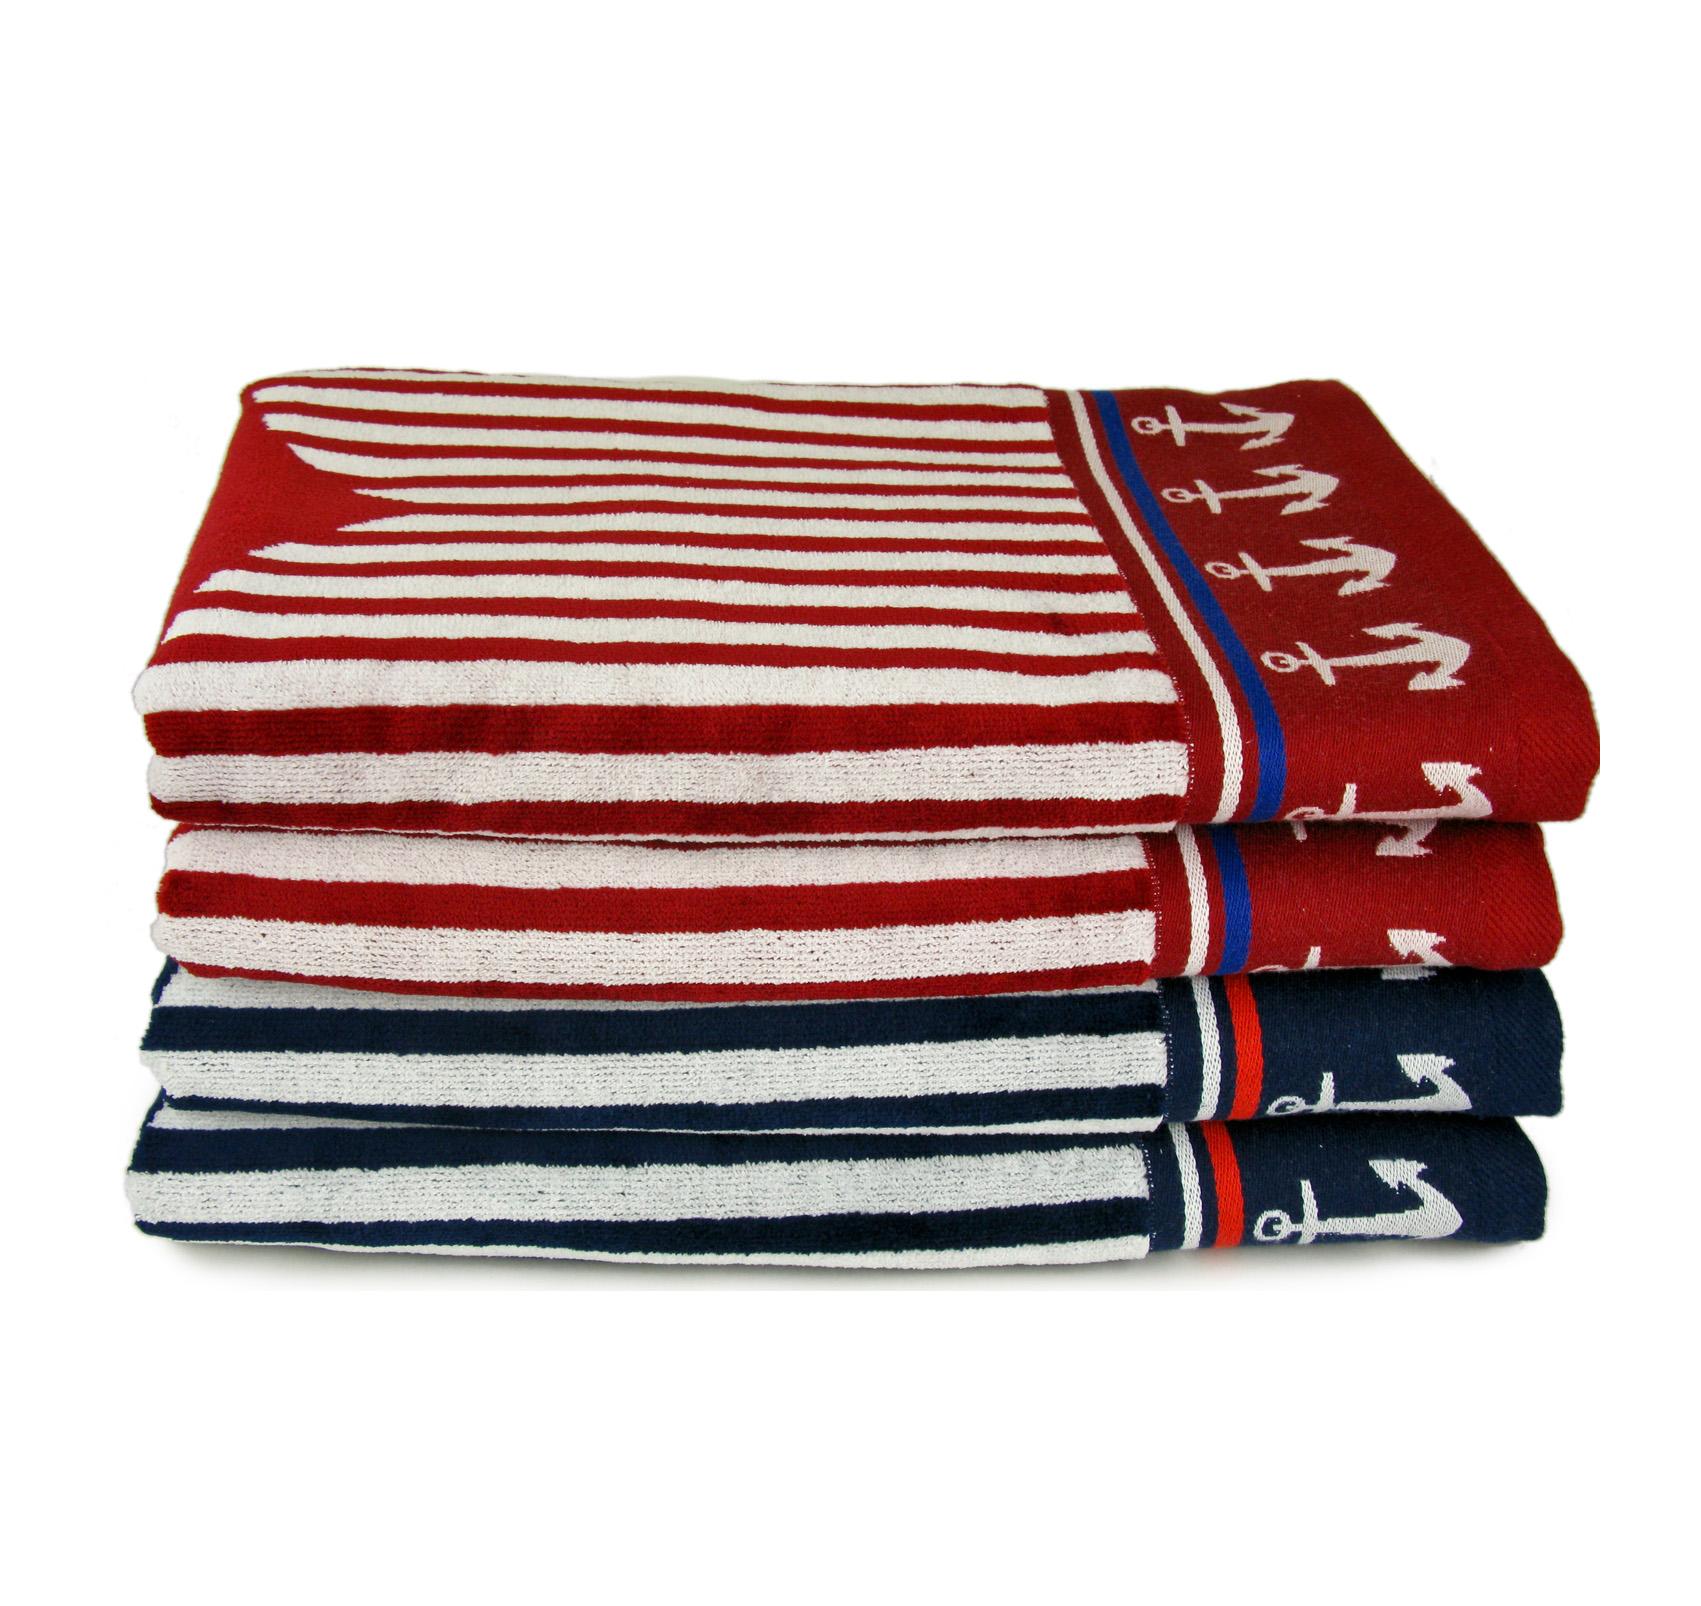 Полотенце Якоря, цвет Синий, размер 50х90 смМахровые полотенца<br>Плотность: 480 г/кв. м<br><br>Тип: Полотенце<br>Размер: 50х90<br>Материал: Махра